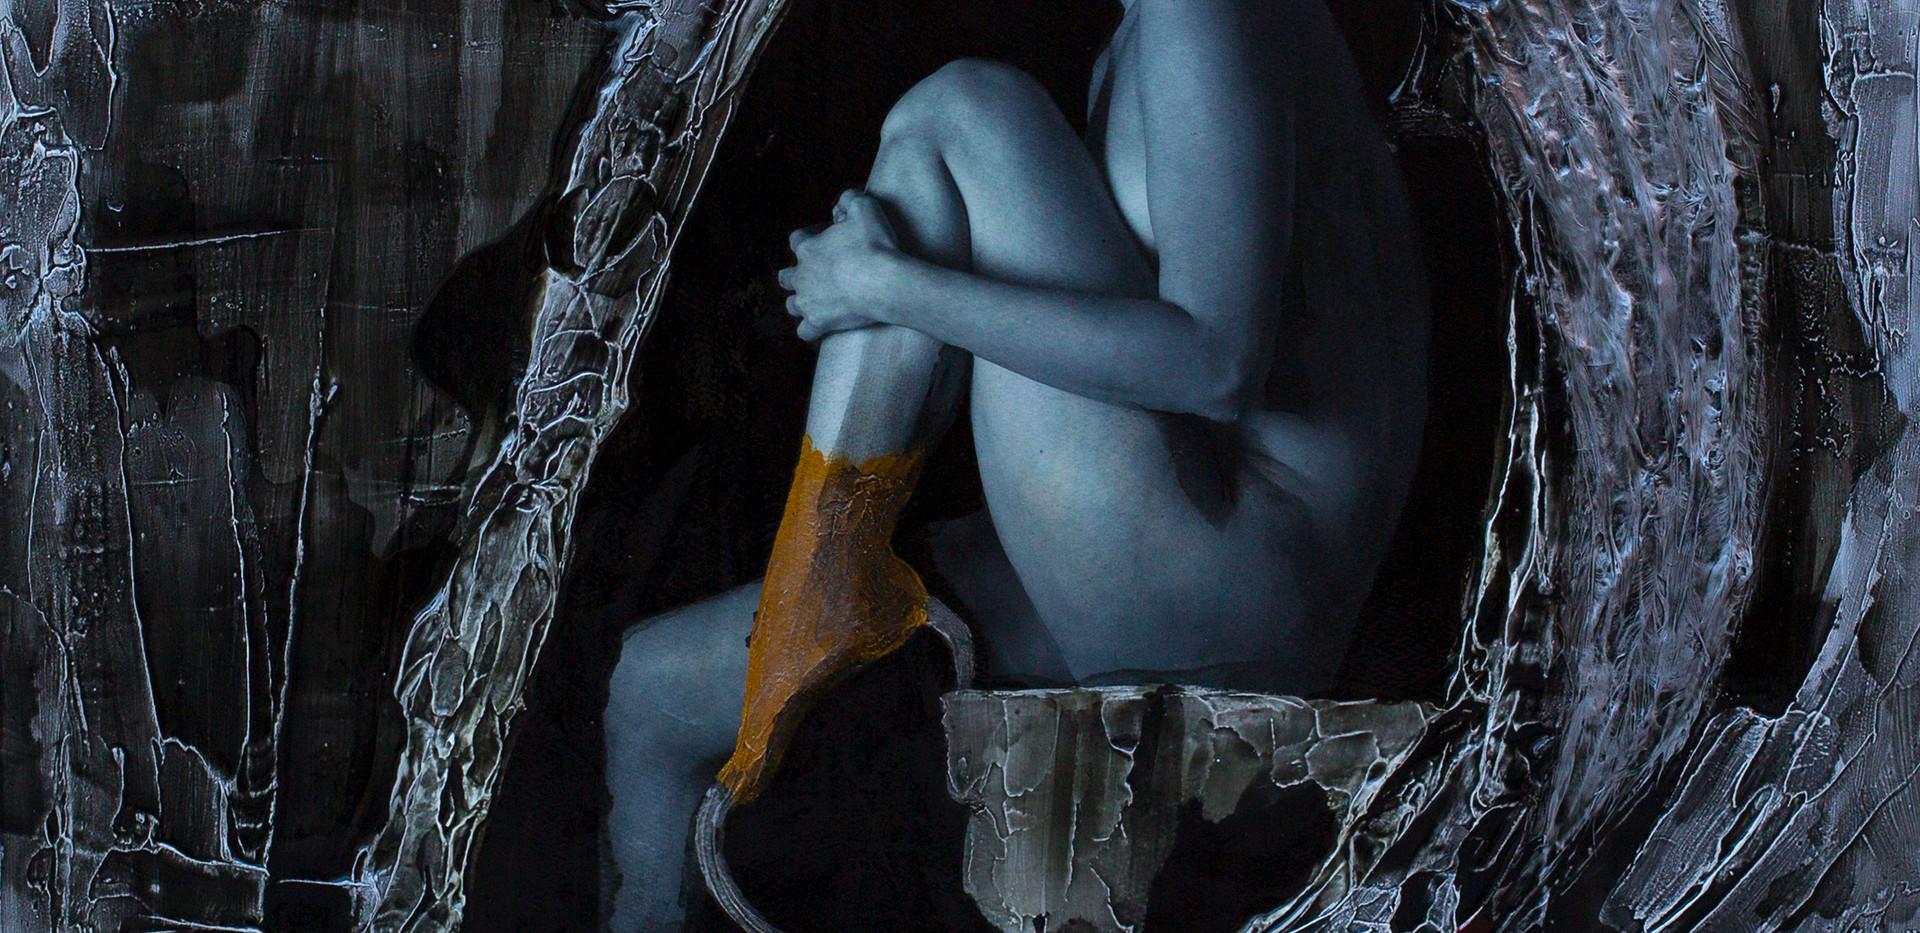 Silver Winged Goddess £1250